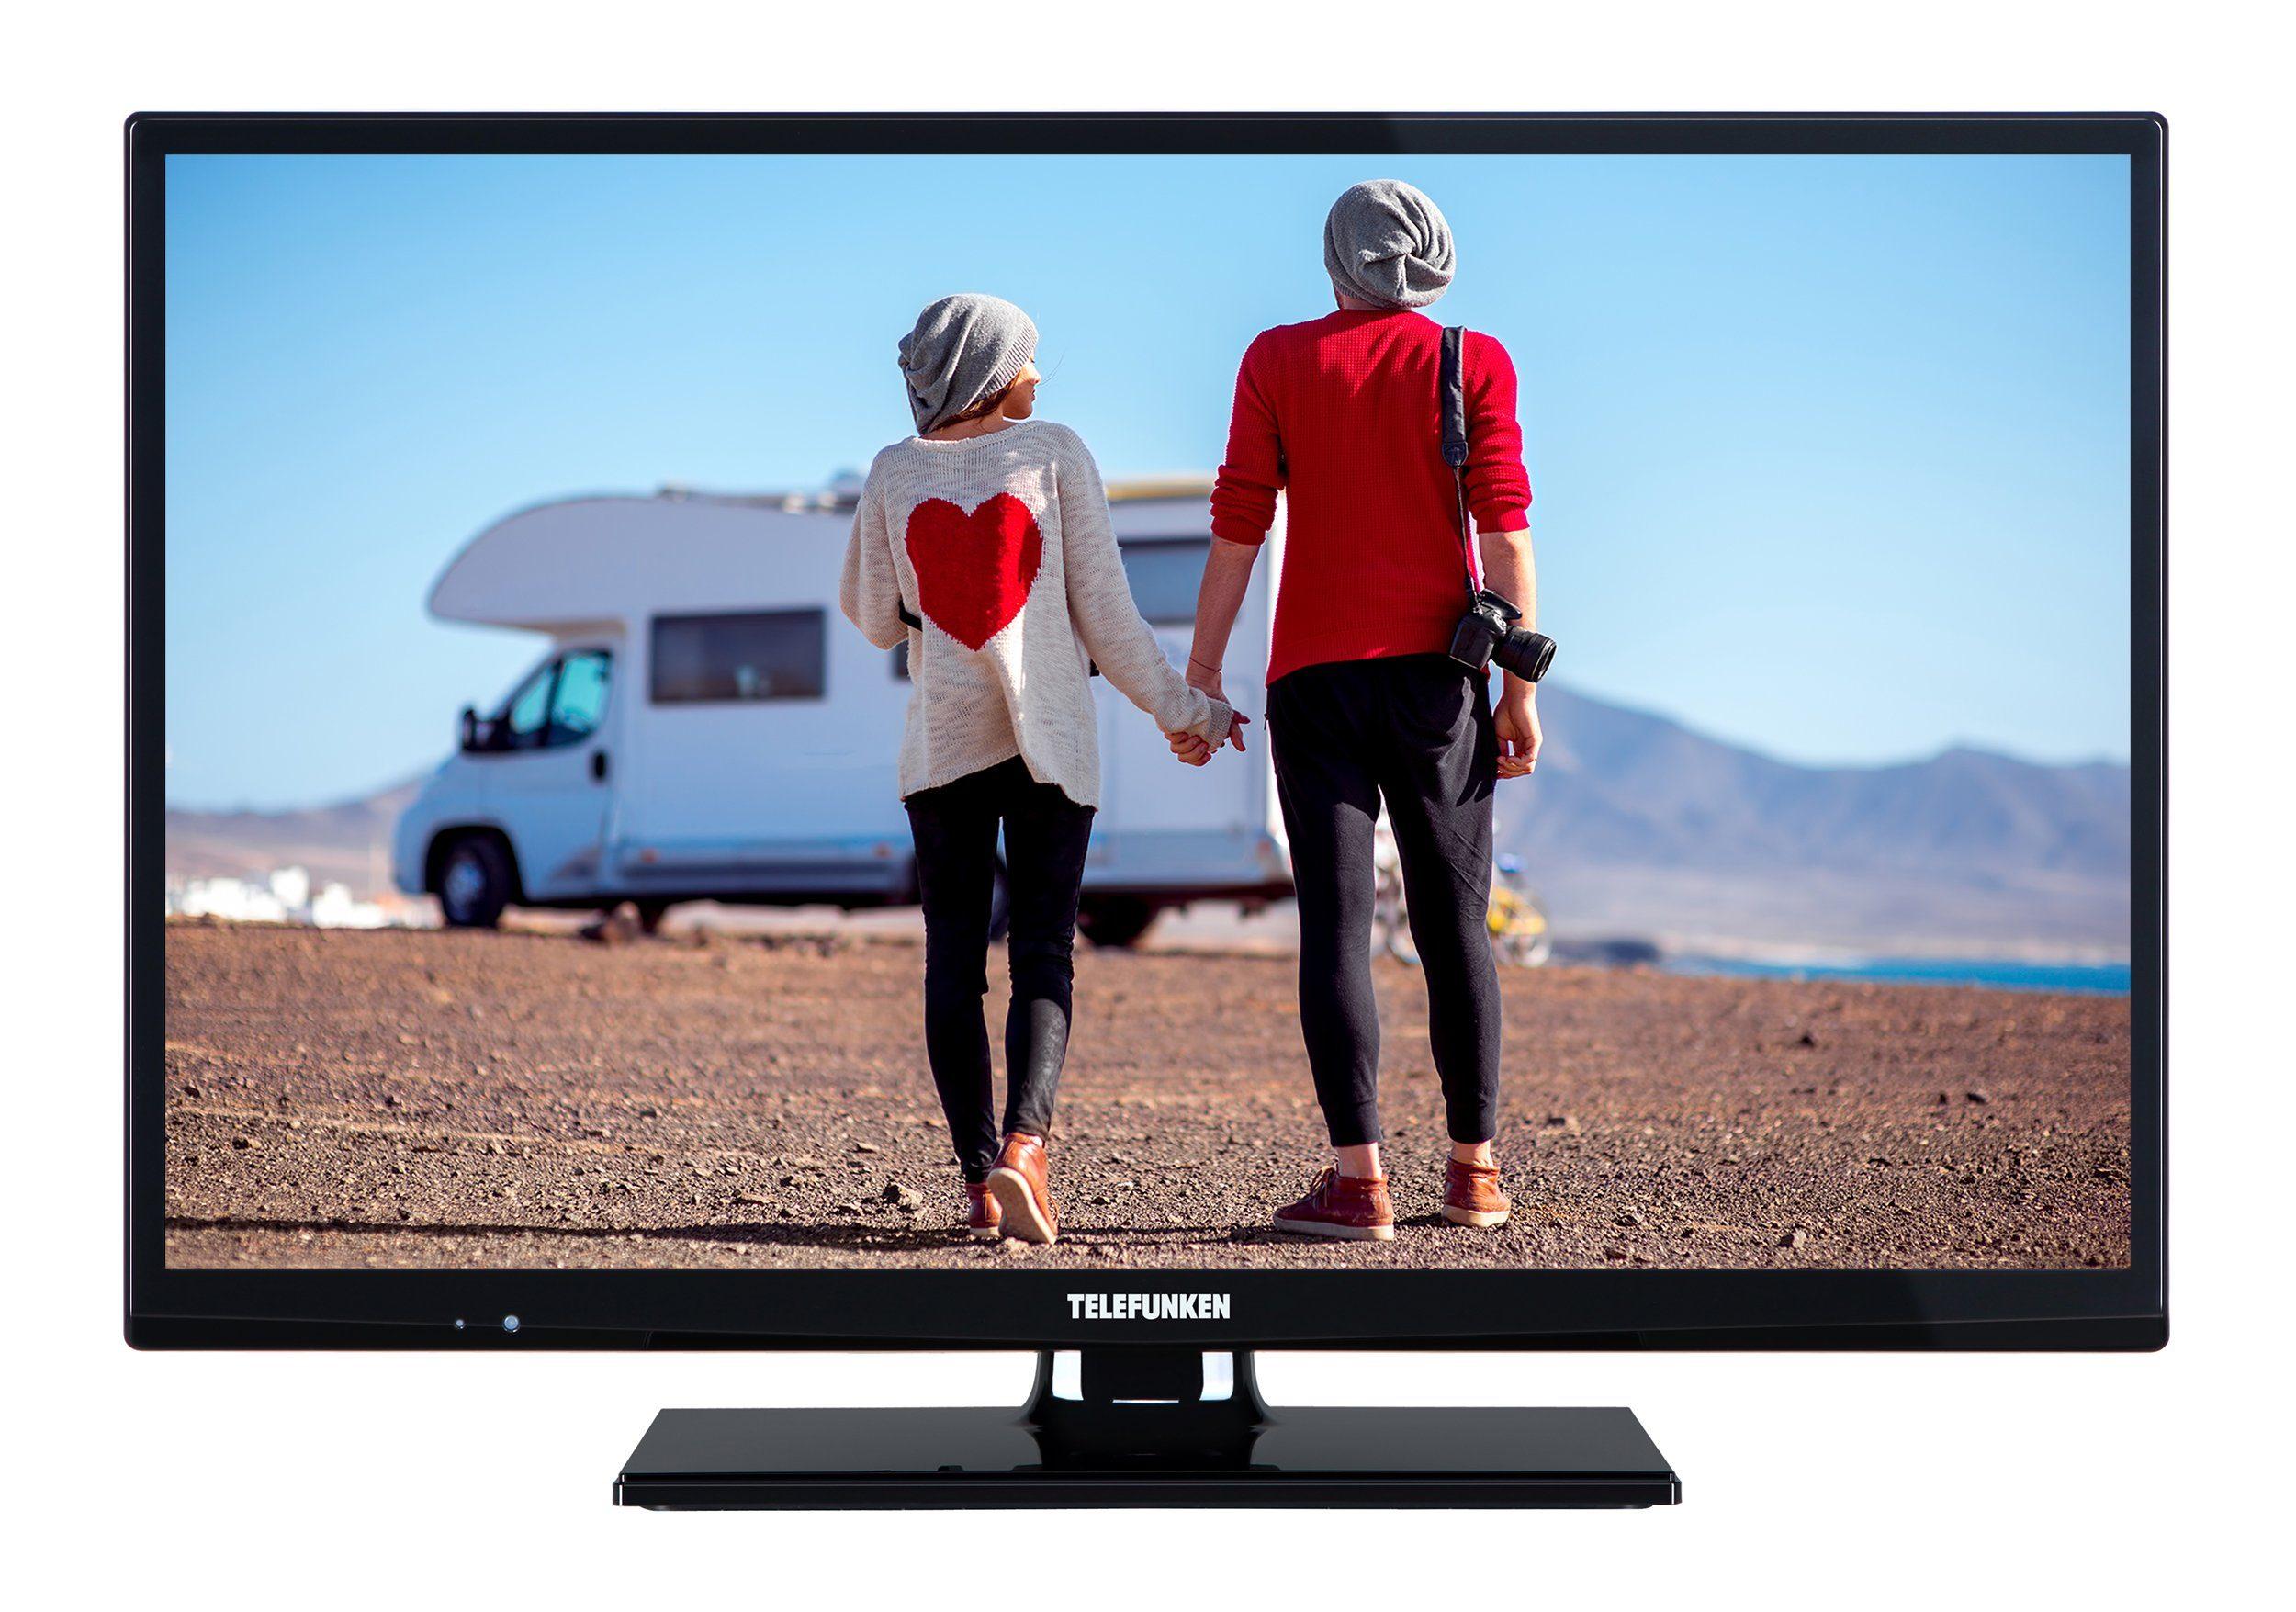 Telefunken LED-Fernseher (24 Zoll, HD-Ready, DVB-T2 HD, 12V) »XH24D101V«